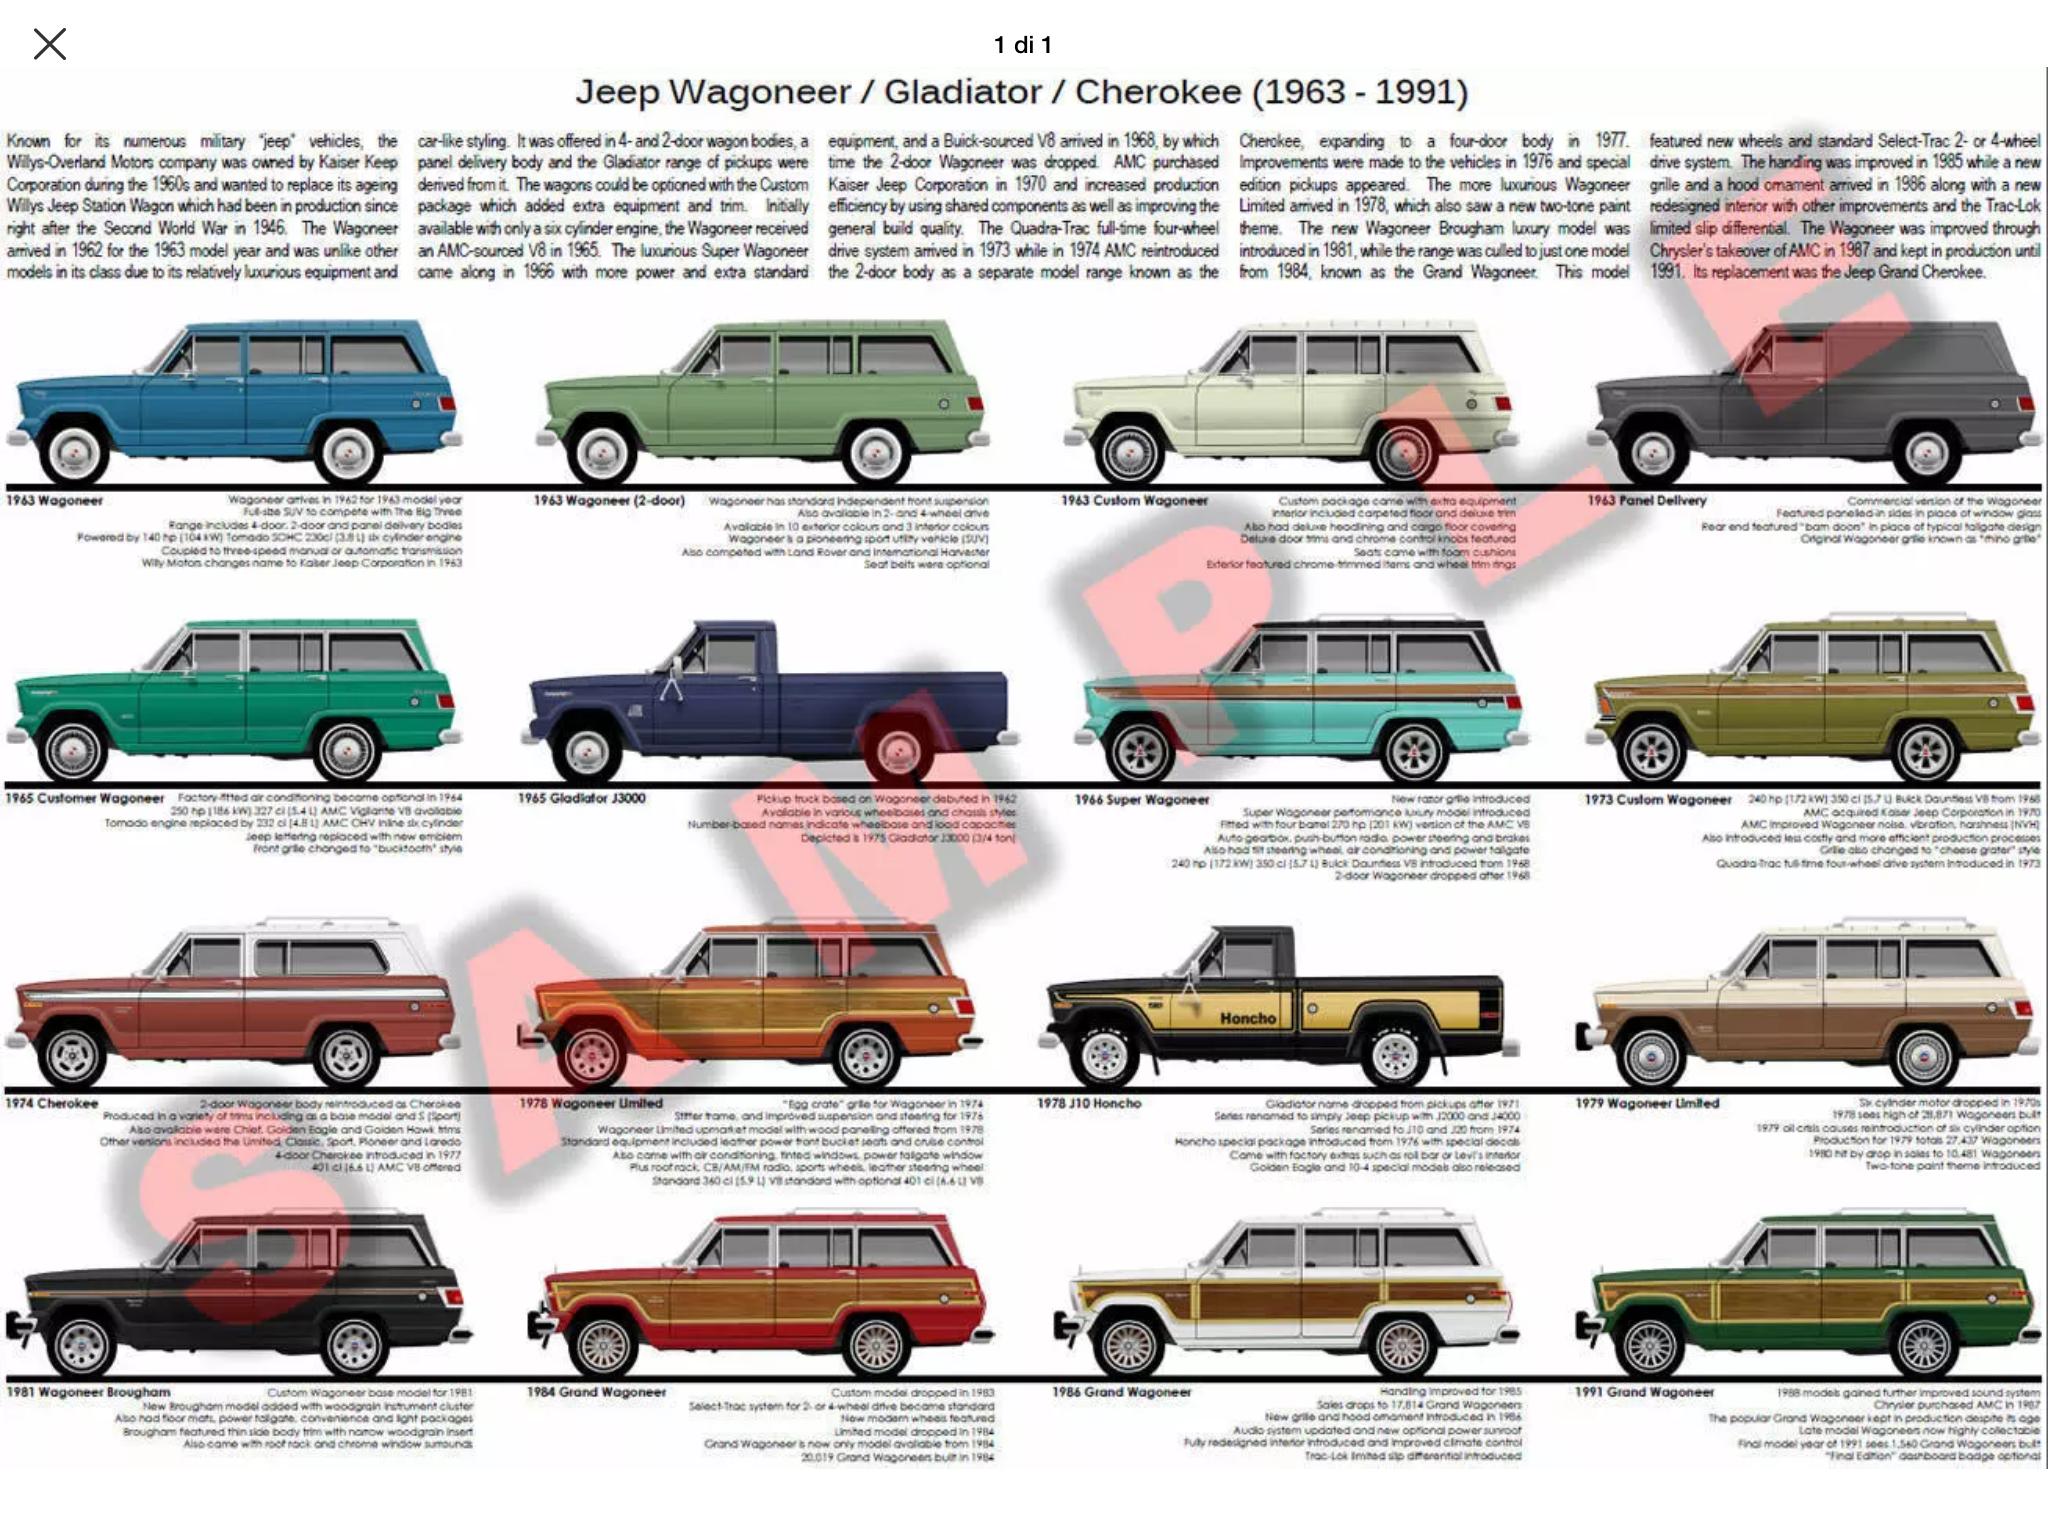 Pin By Rapom Jadwisiak On Cars Jeep Wagoneer Jeep Jeep Truck